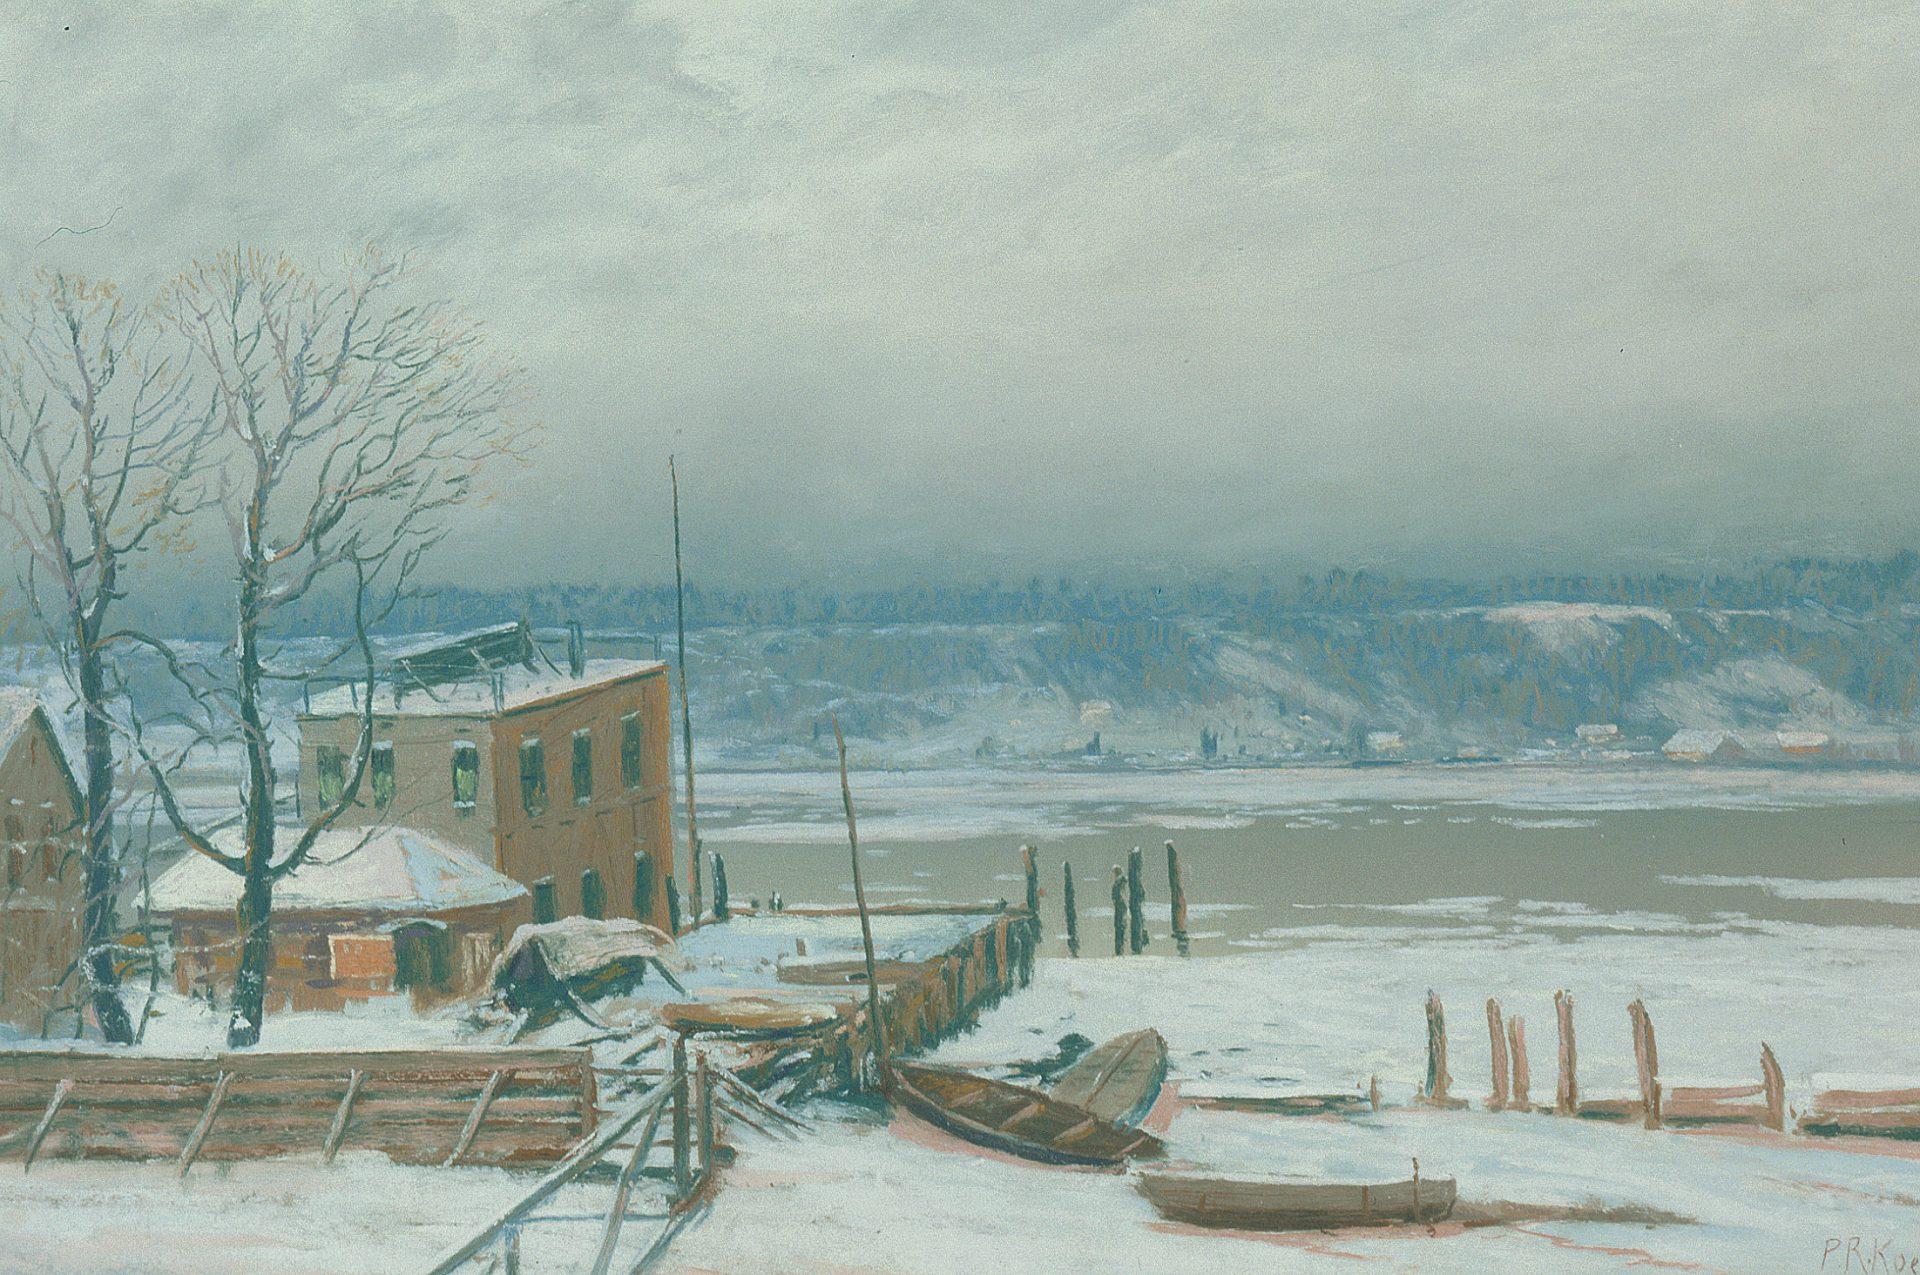 Palisades, New Jersey, Winter (Paul R. Koehler)